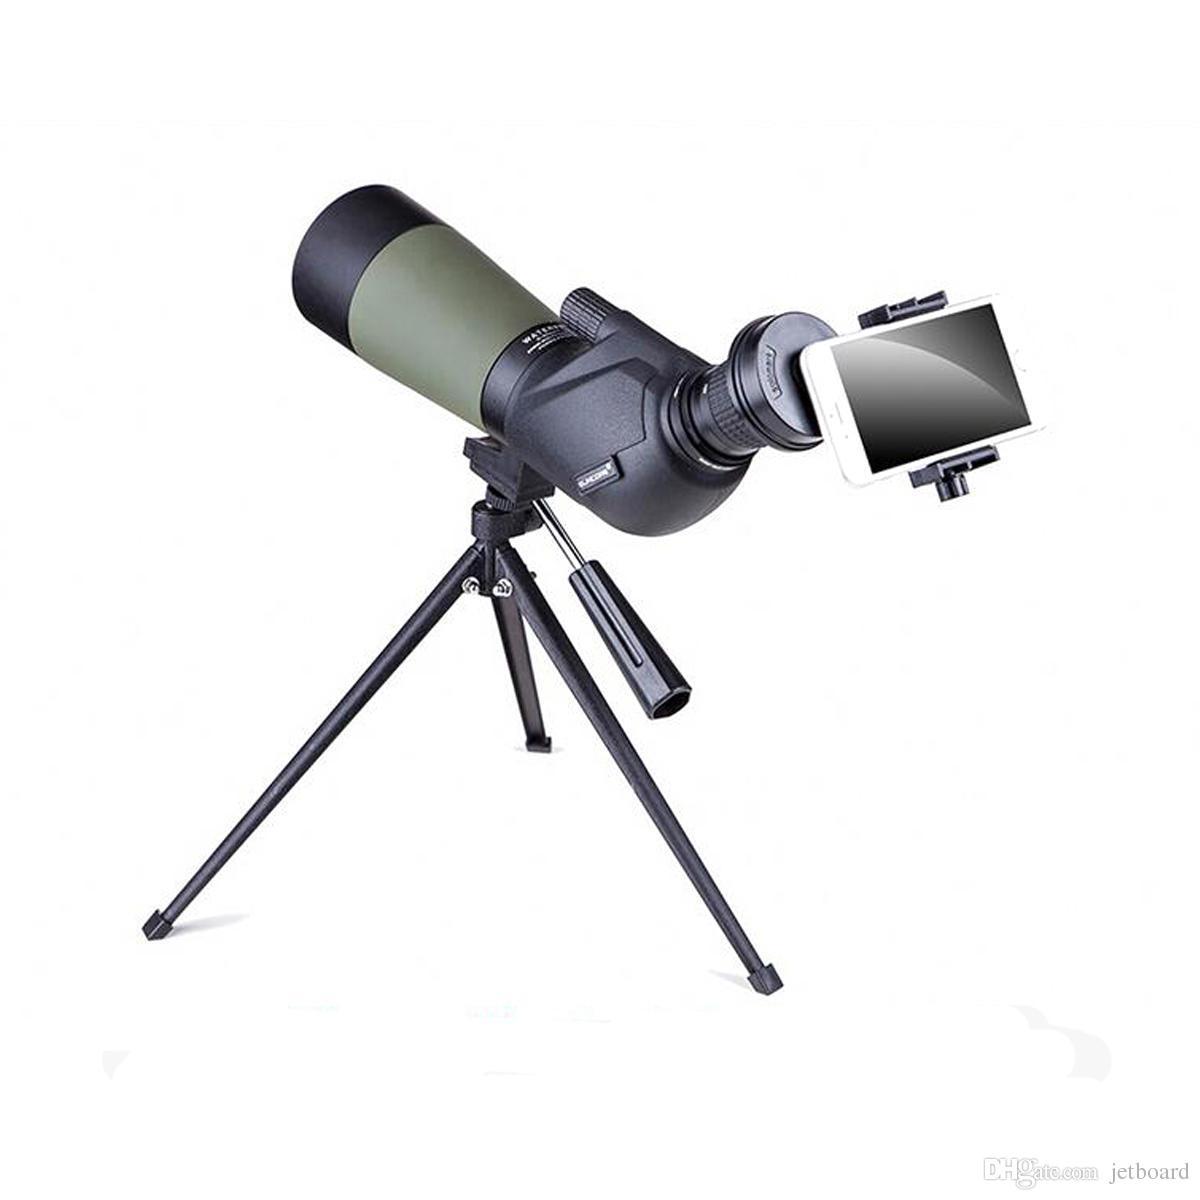 15 45x60s monocular telescope hd optic zoom lens bird watching high15 45x60s monocular telescope hd optic zoom lens bird watching high definition view eyepiece spotting scope birdwatching scope best binoculars binocular